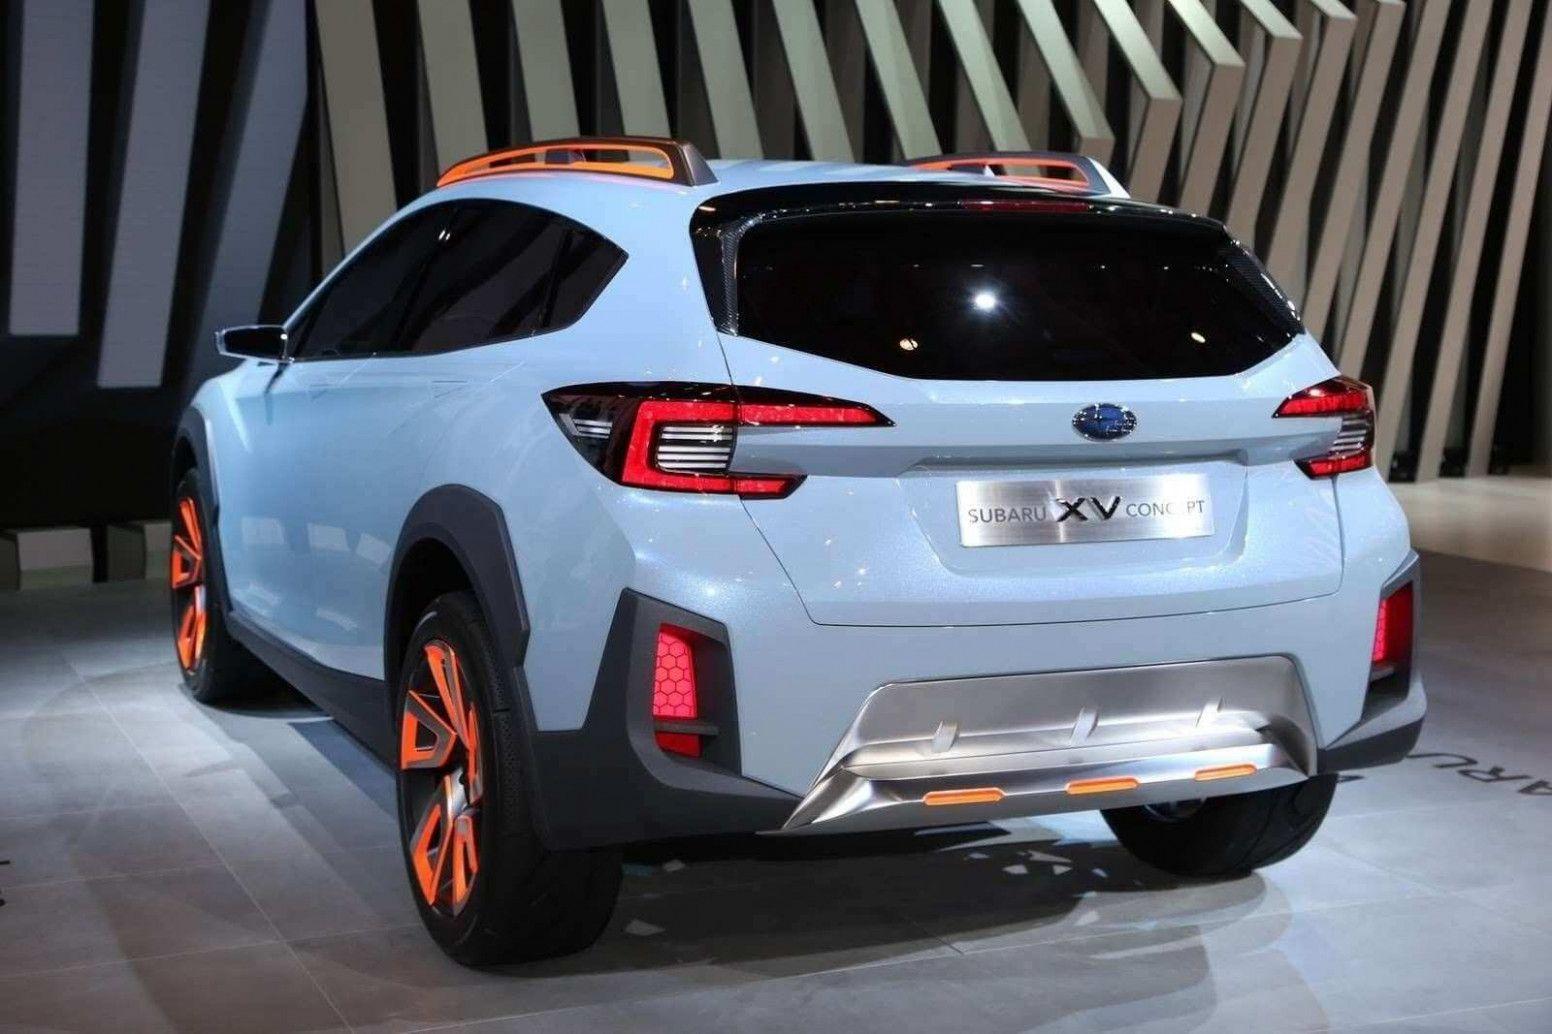 2020 Subaru Crosstrek Hybridand Release Date And Concept In 2020 Subaru Crosstrek Subaru Car